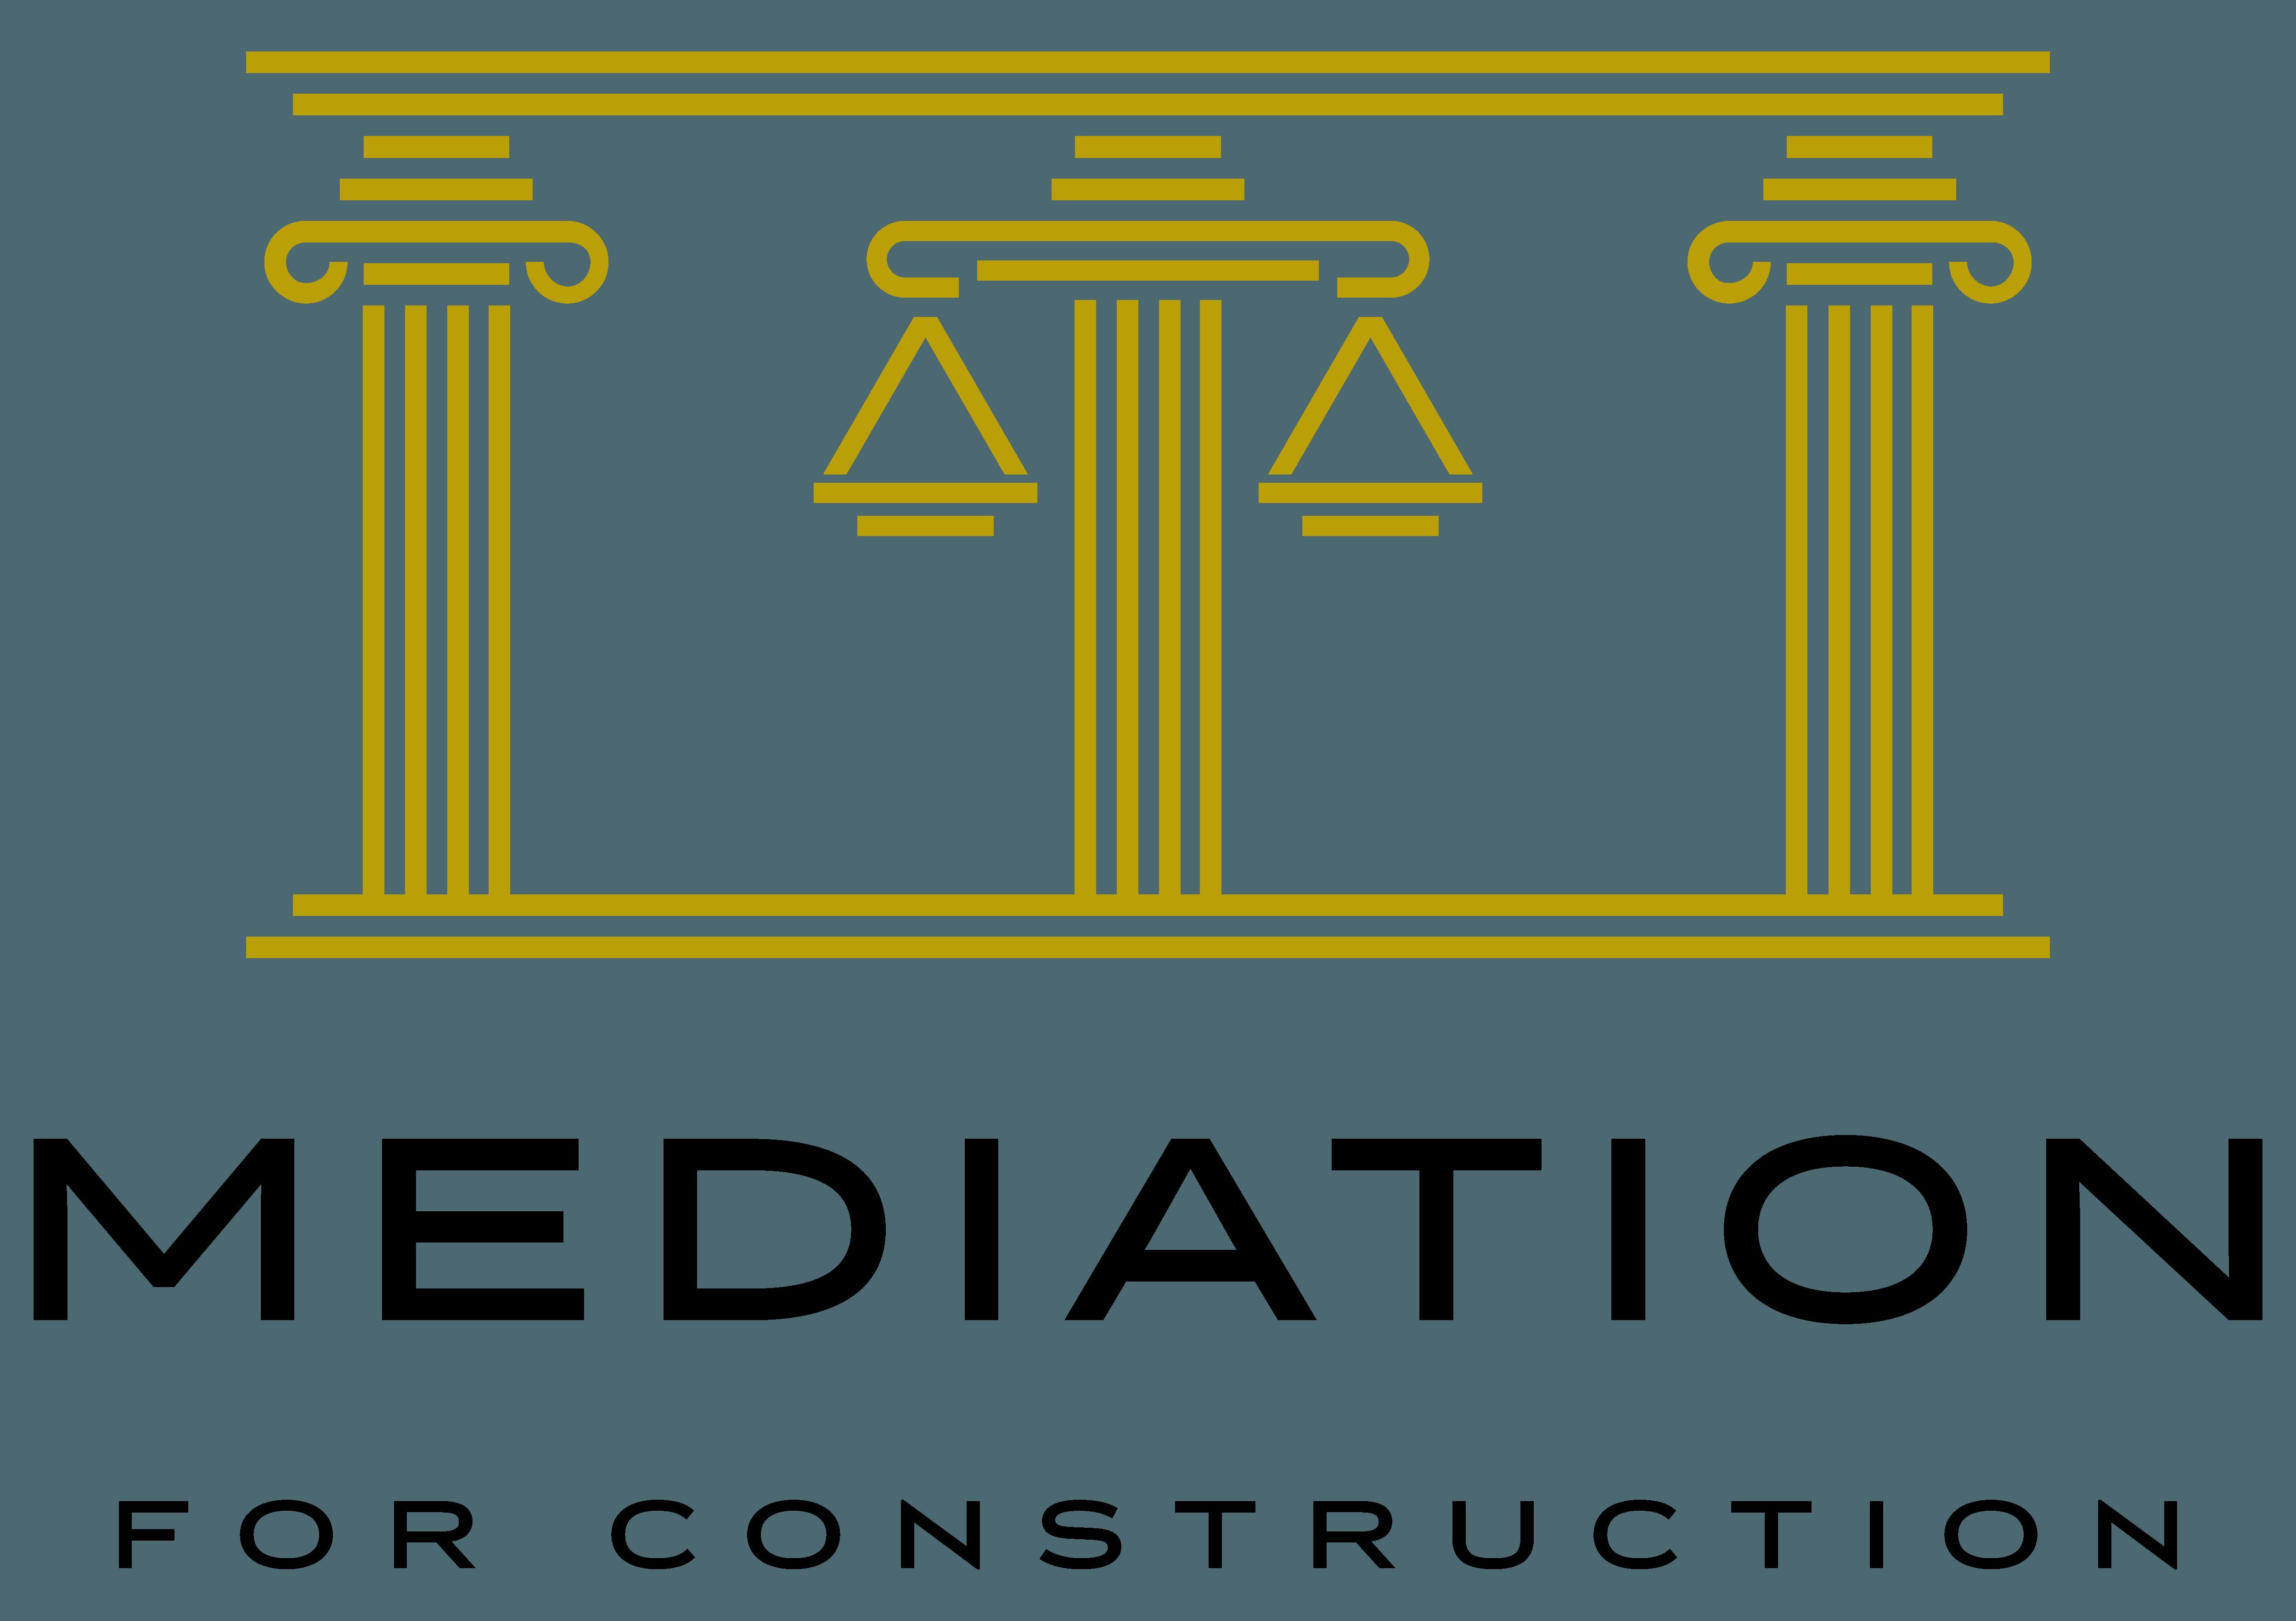 MEDIATION FOR CONSTRUCTION logo